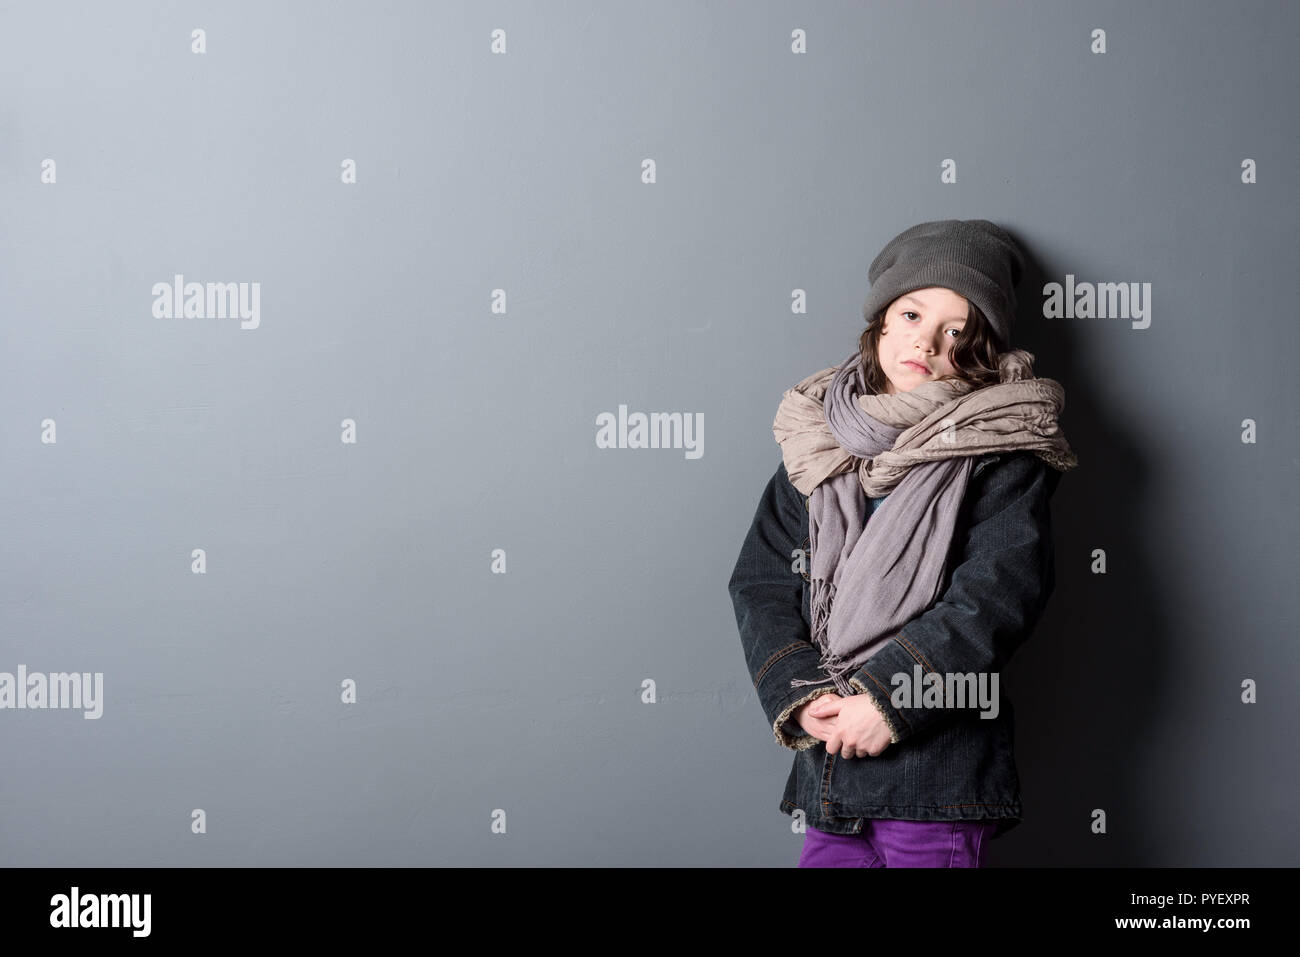 Hopeless girl wearing shabby clothes - Stock Image